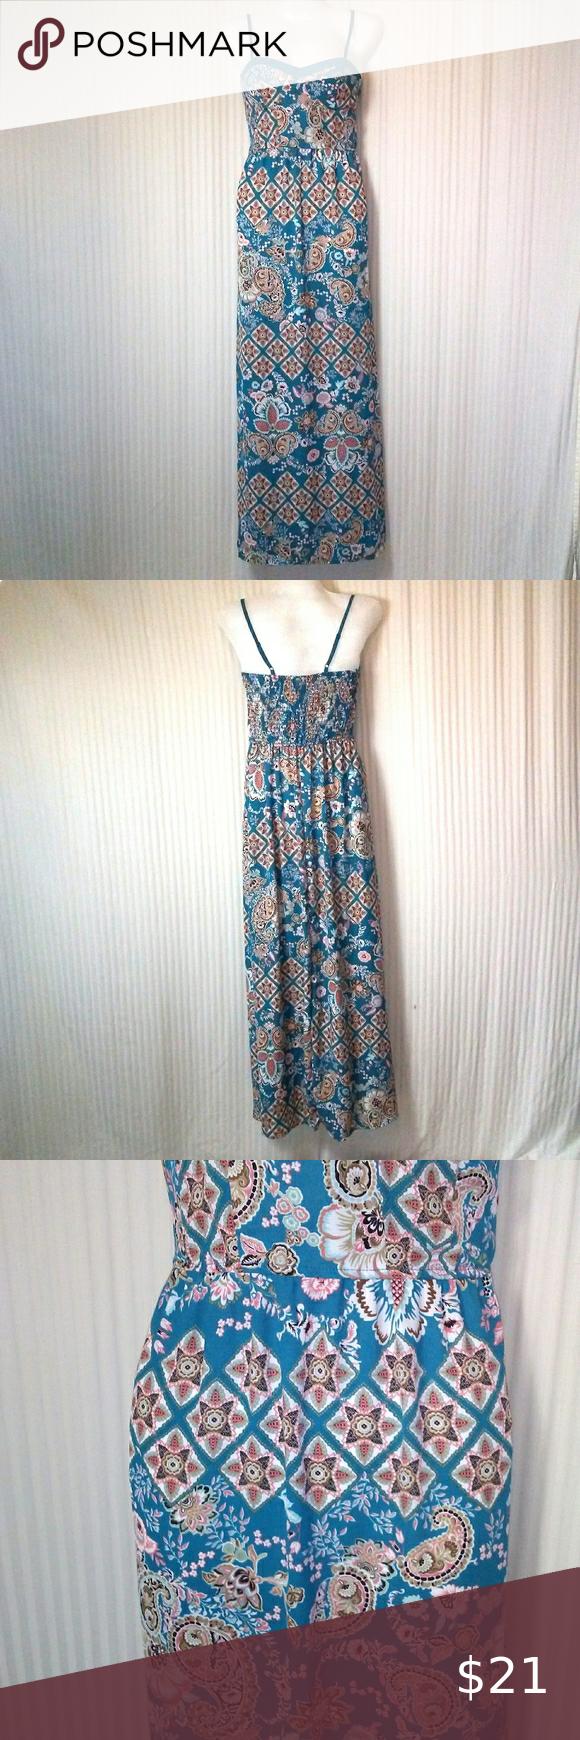 Xhilaration Maxi Dress Small Dresses Clothes Design Fashion [ 1740 x 580 Pixel ]